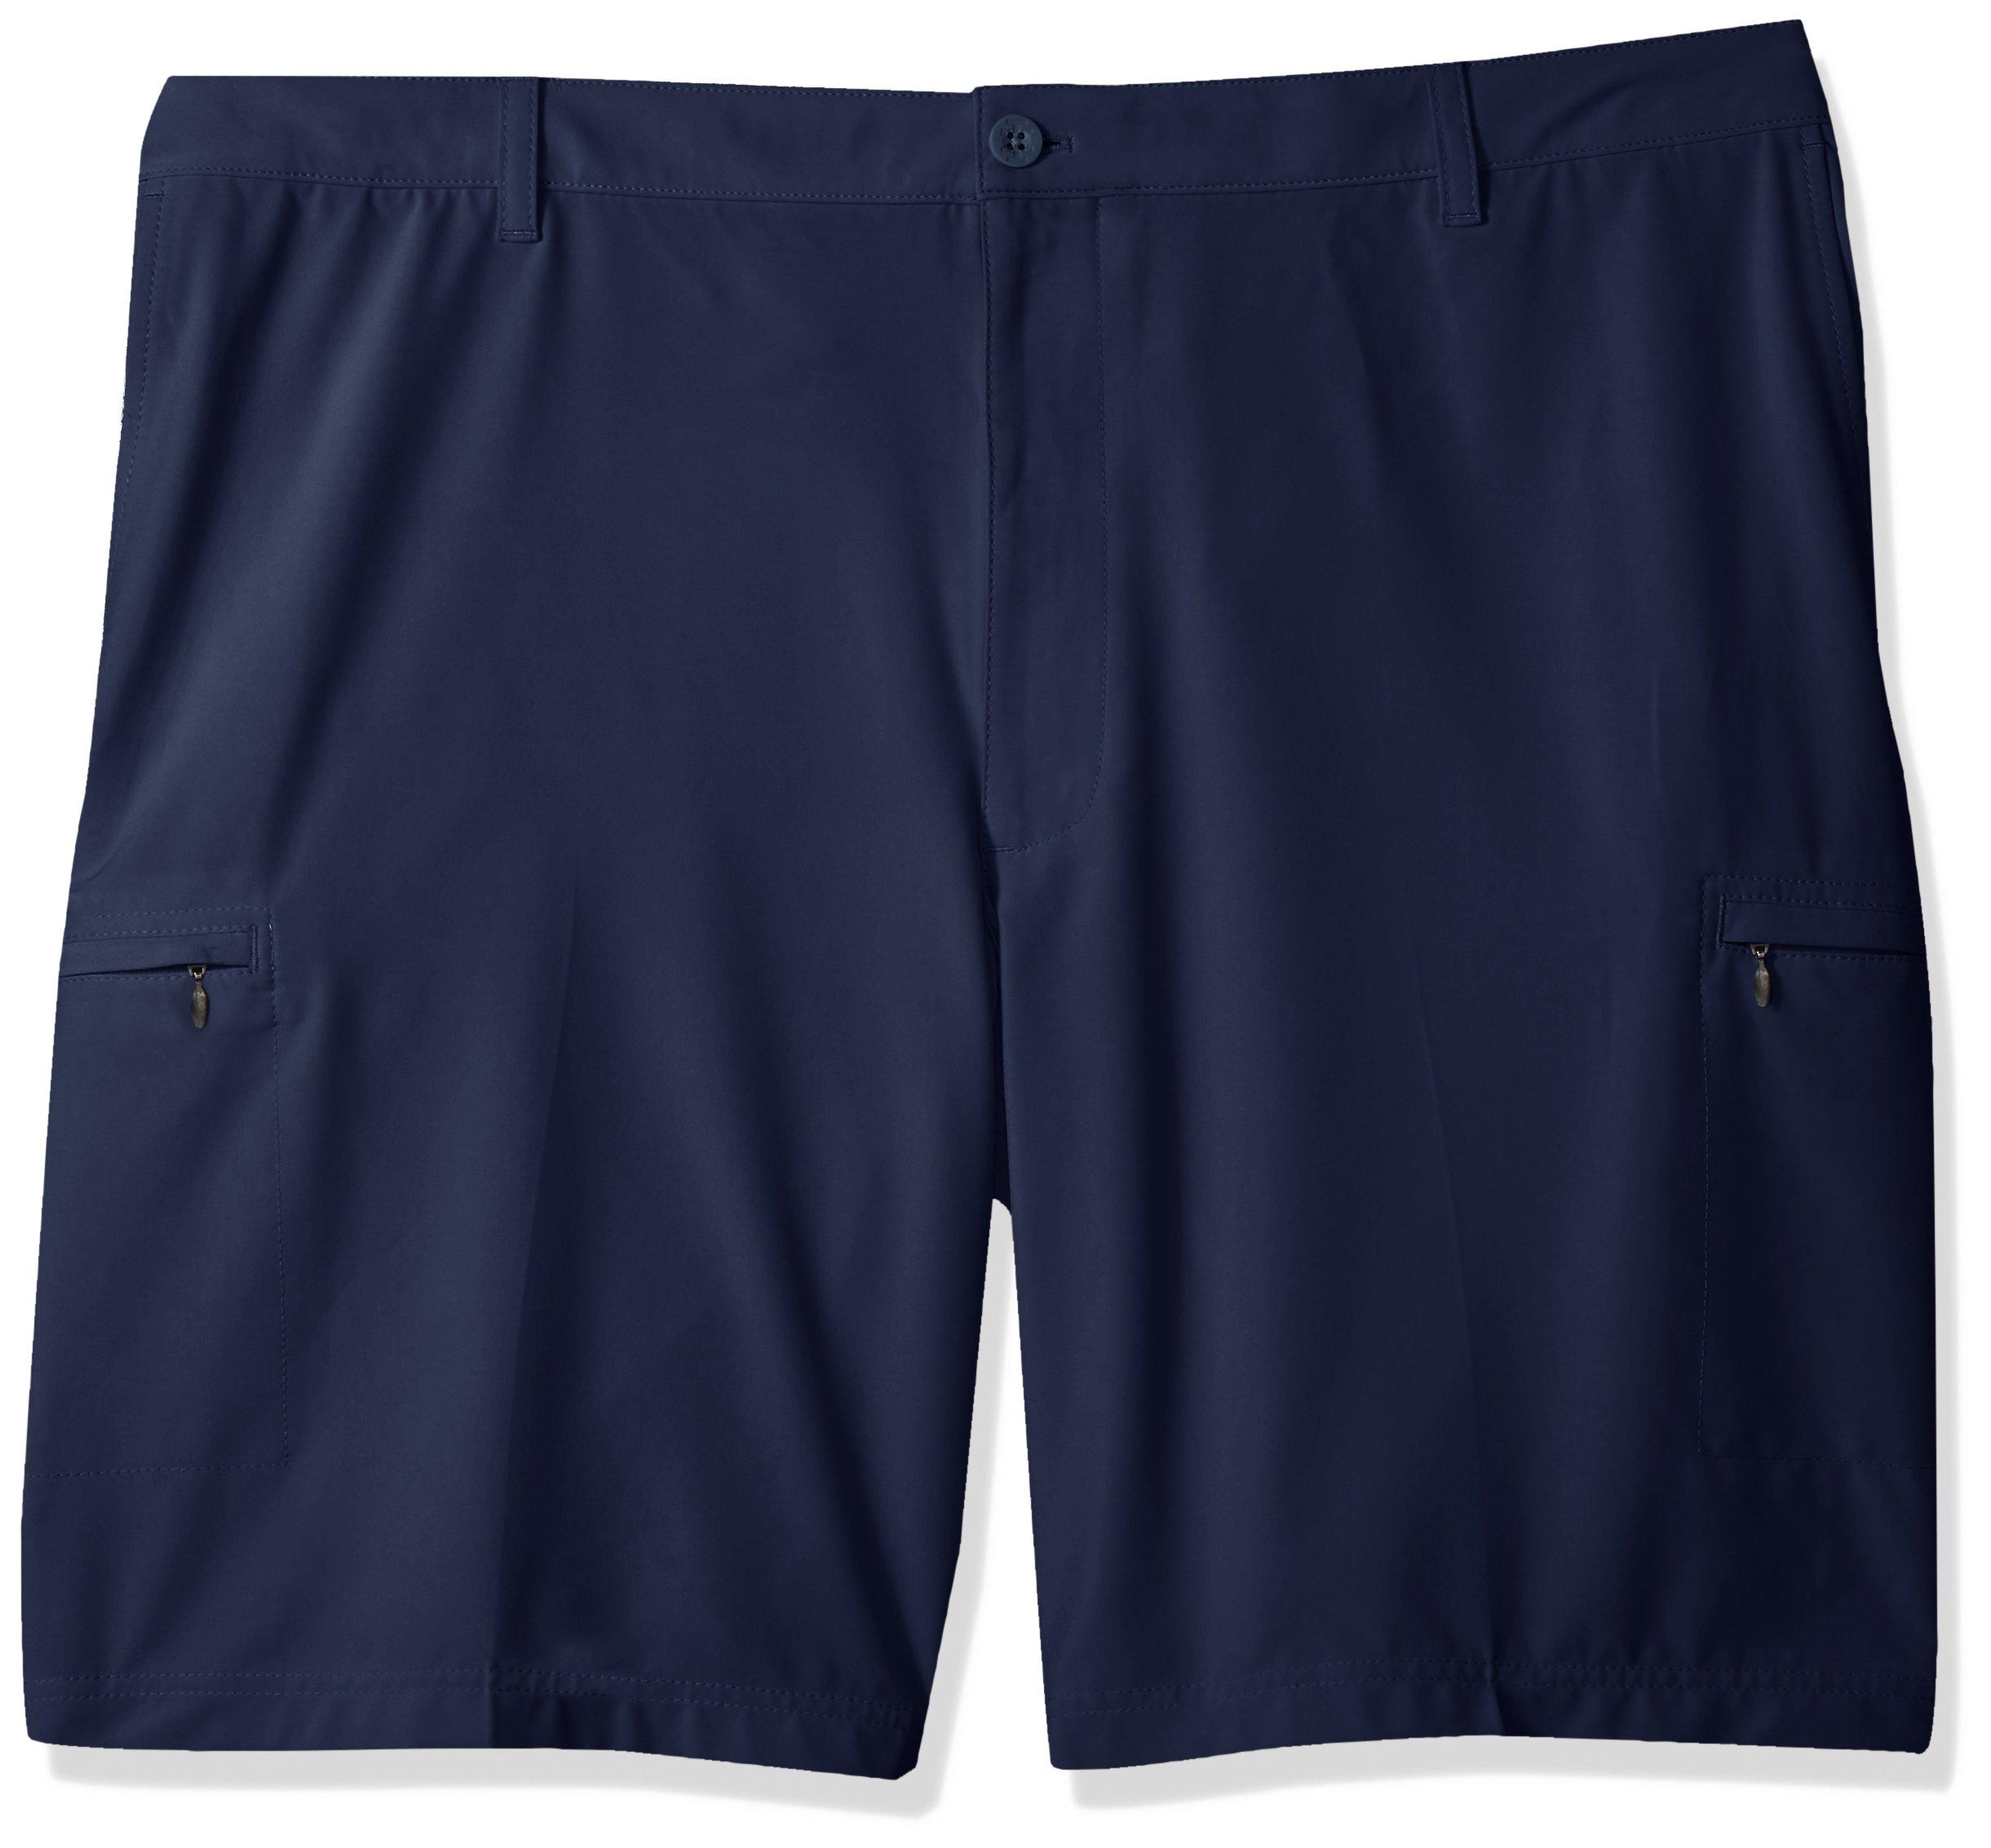 IZOD Men's Big and Tall Swing Flex Cargo Short, Peacoat/Blue, 46